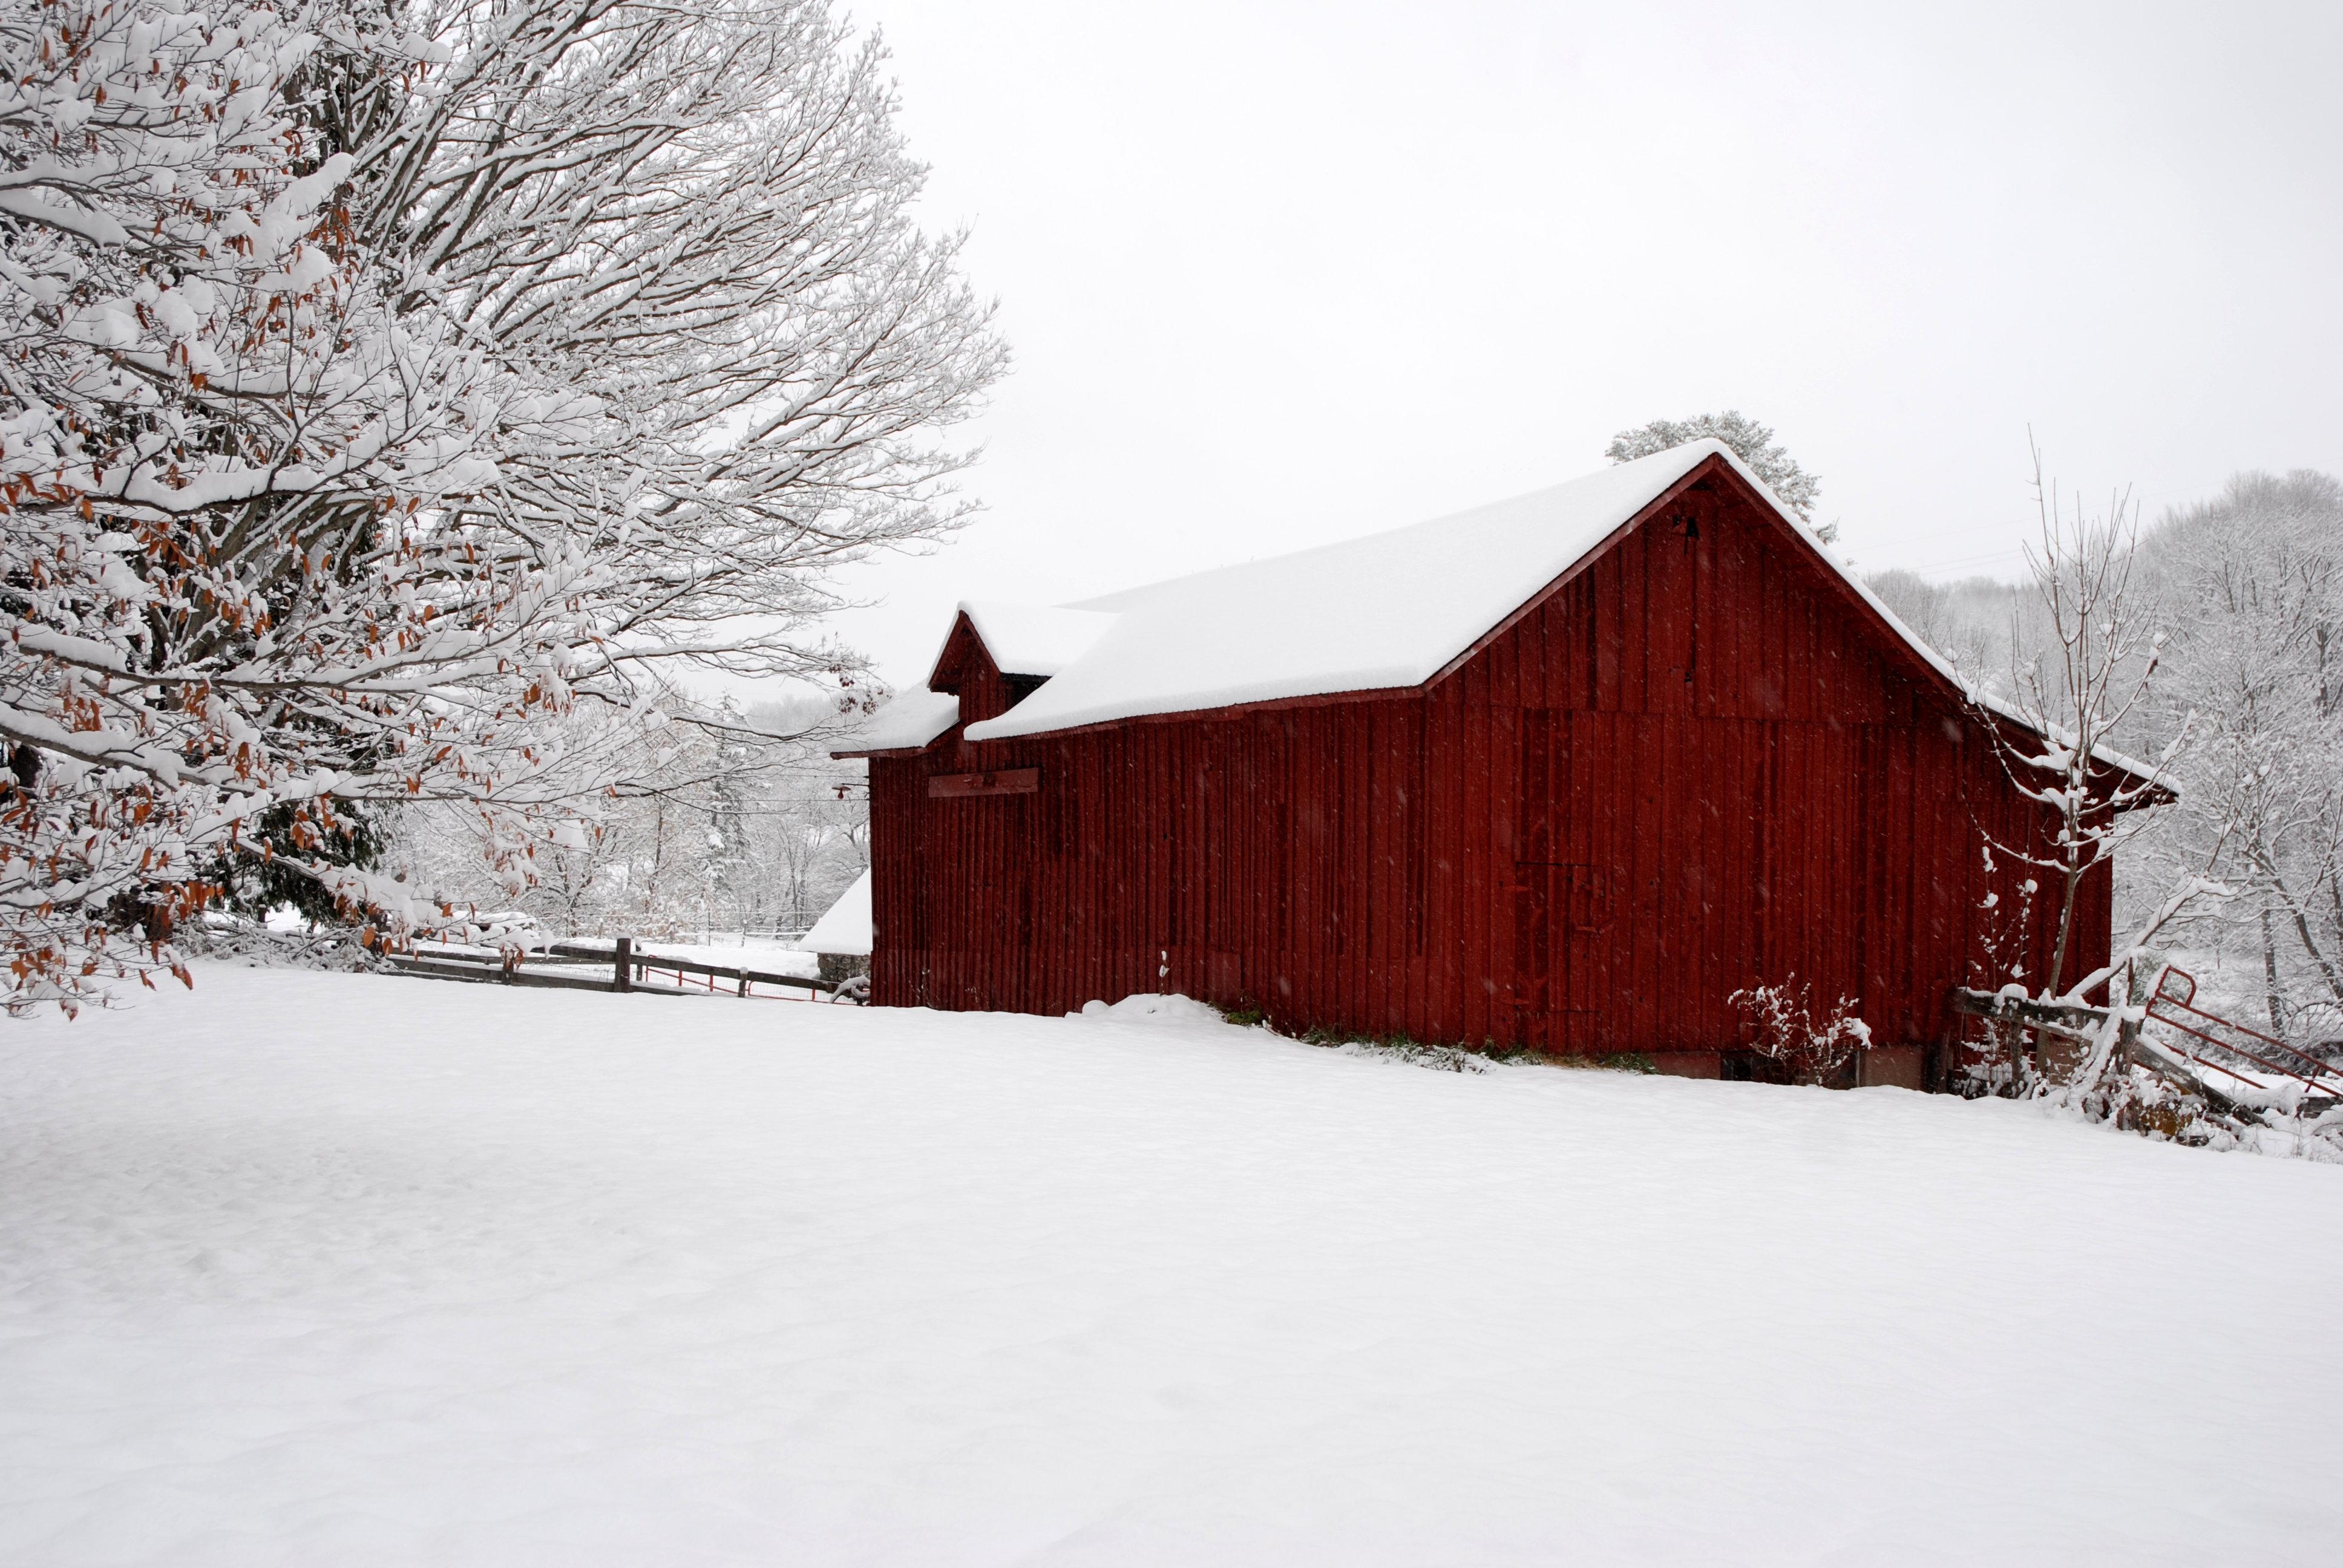 red-barn-in-snow.jpg